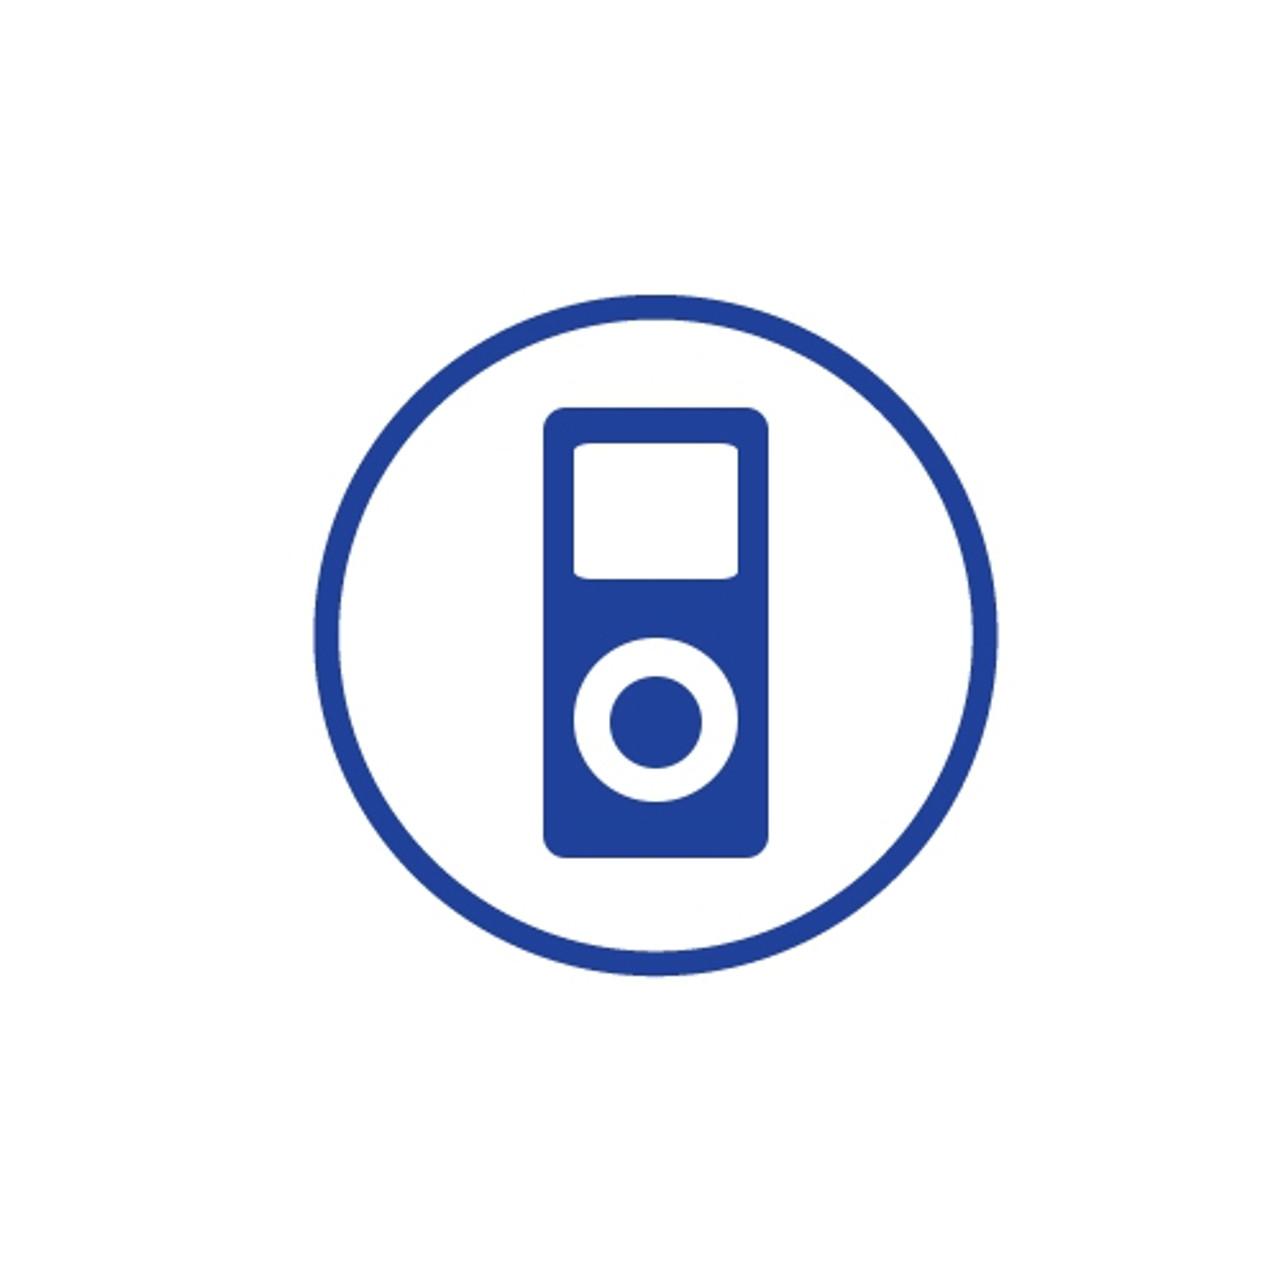 iPod Integration